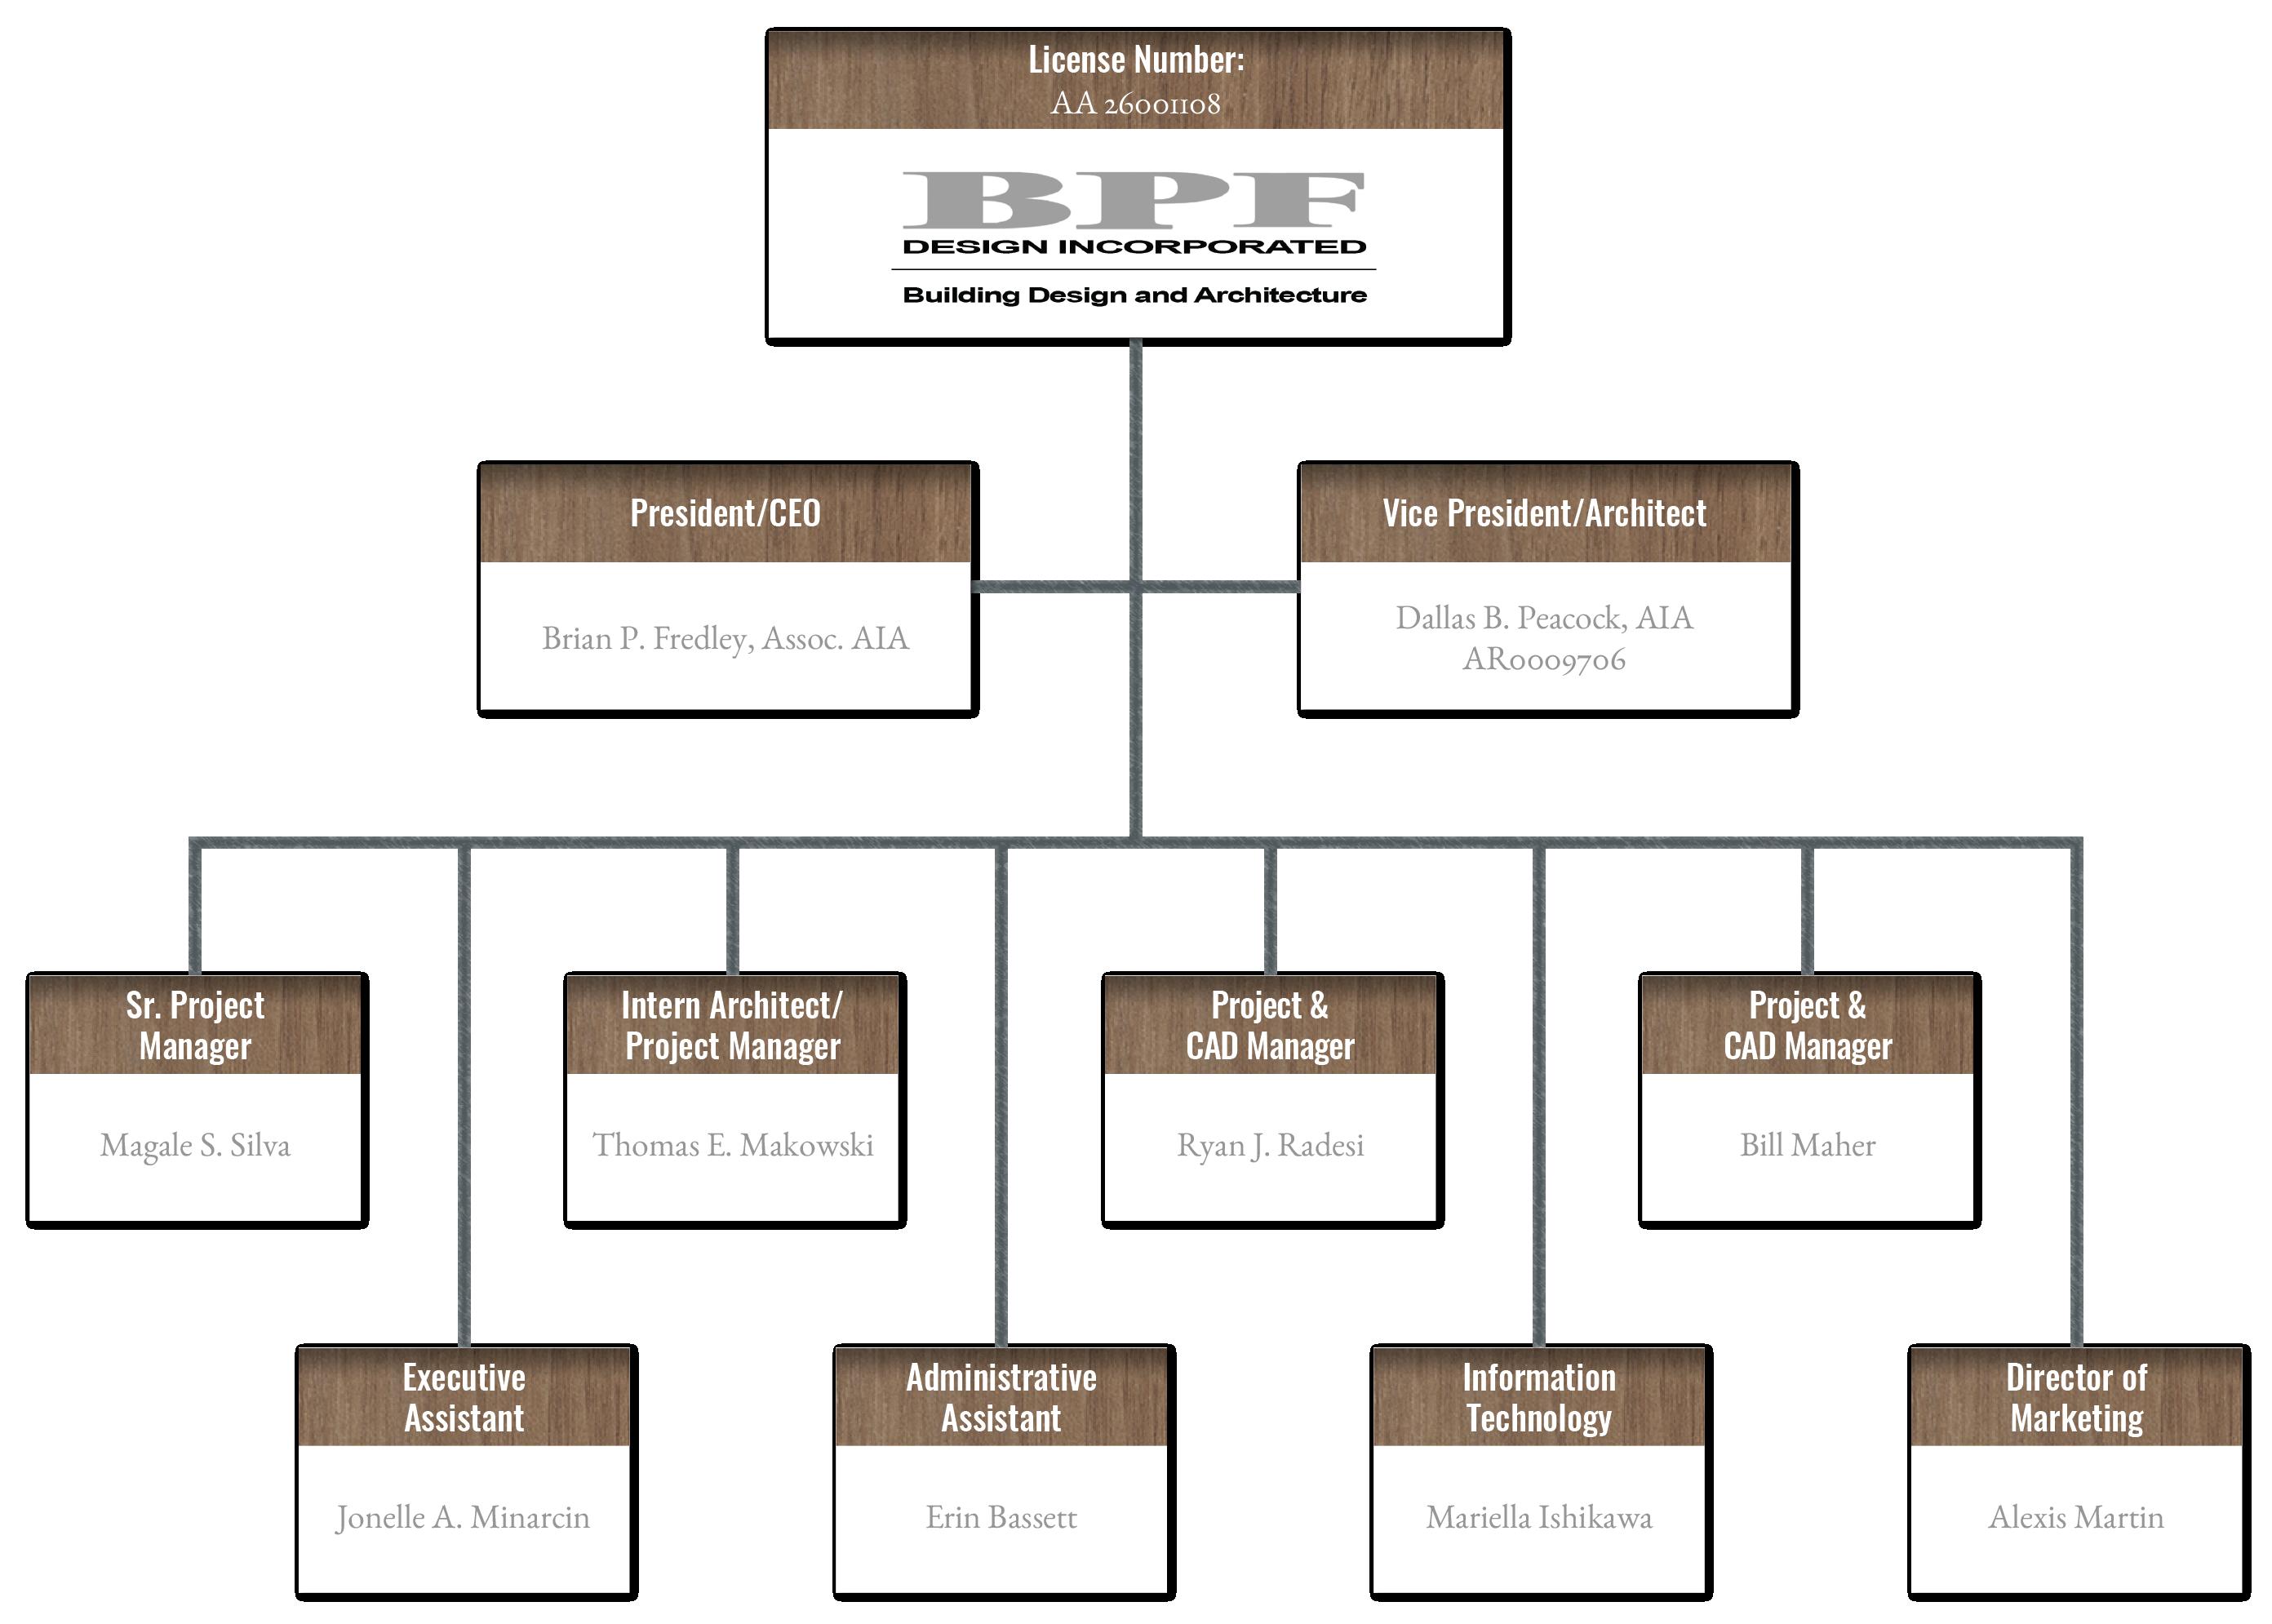 BPF Design, Inc. organizational chart.